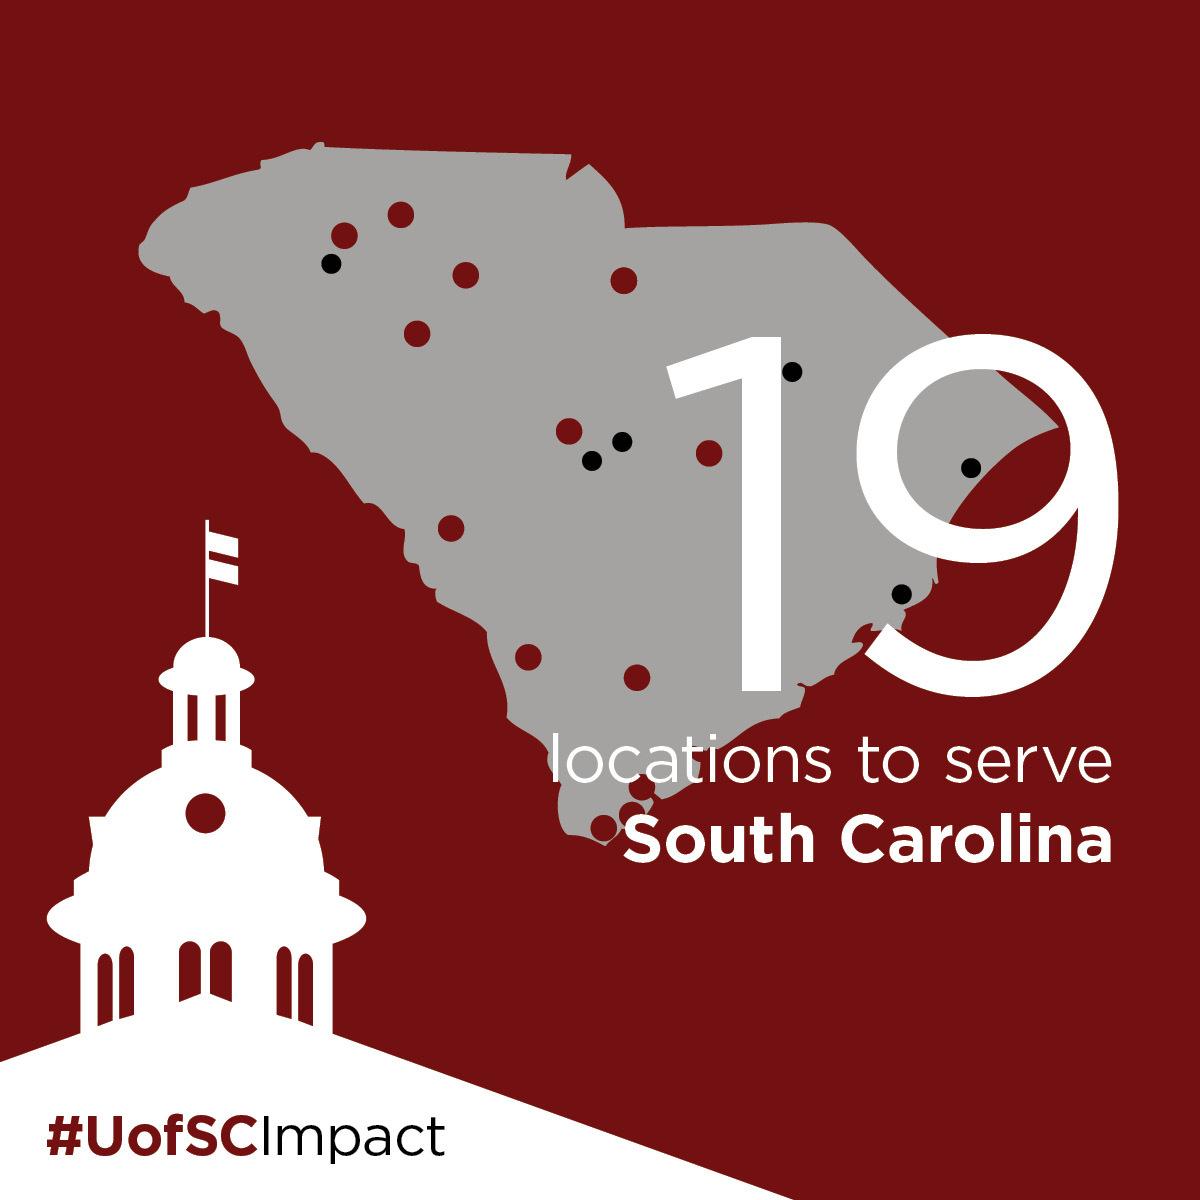 19 locations to serve SC #UofSCImpact